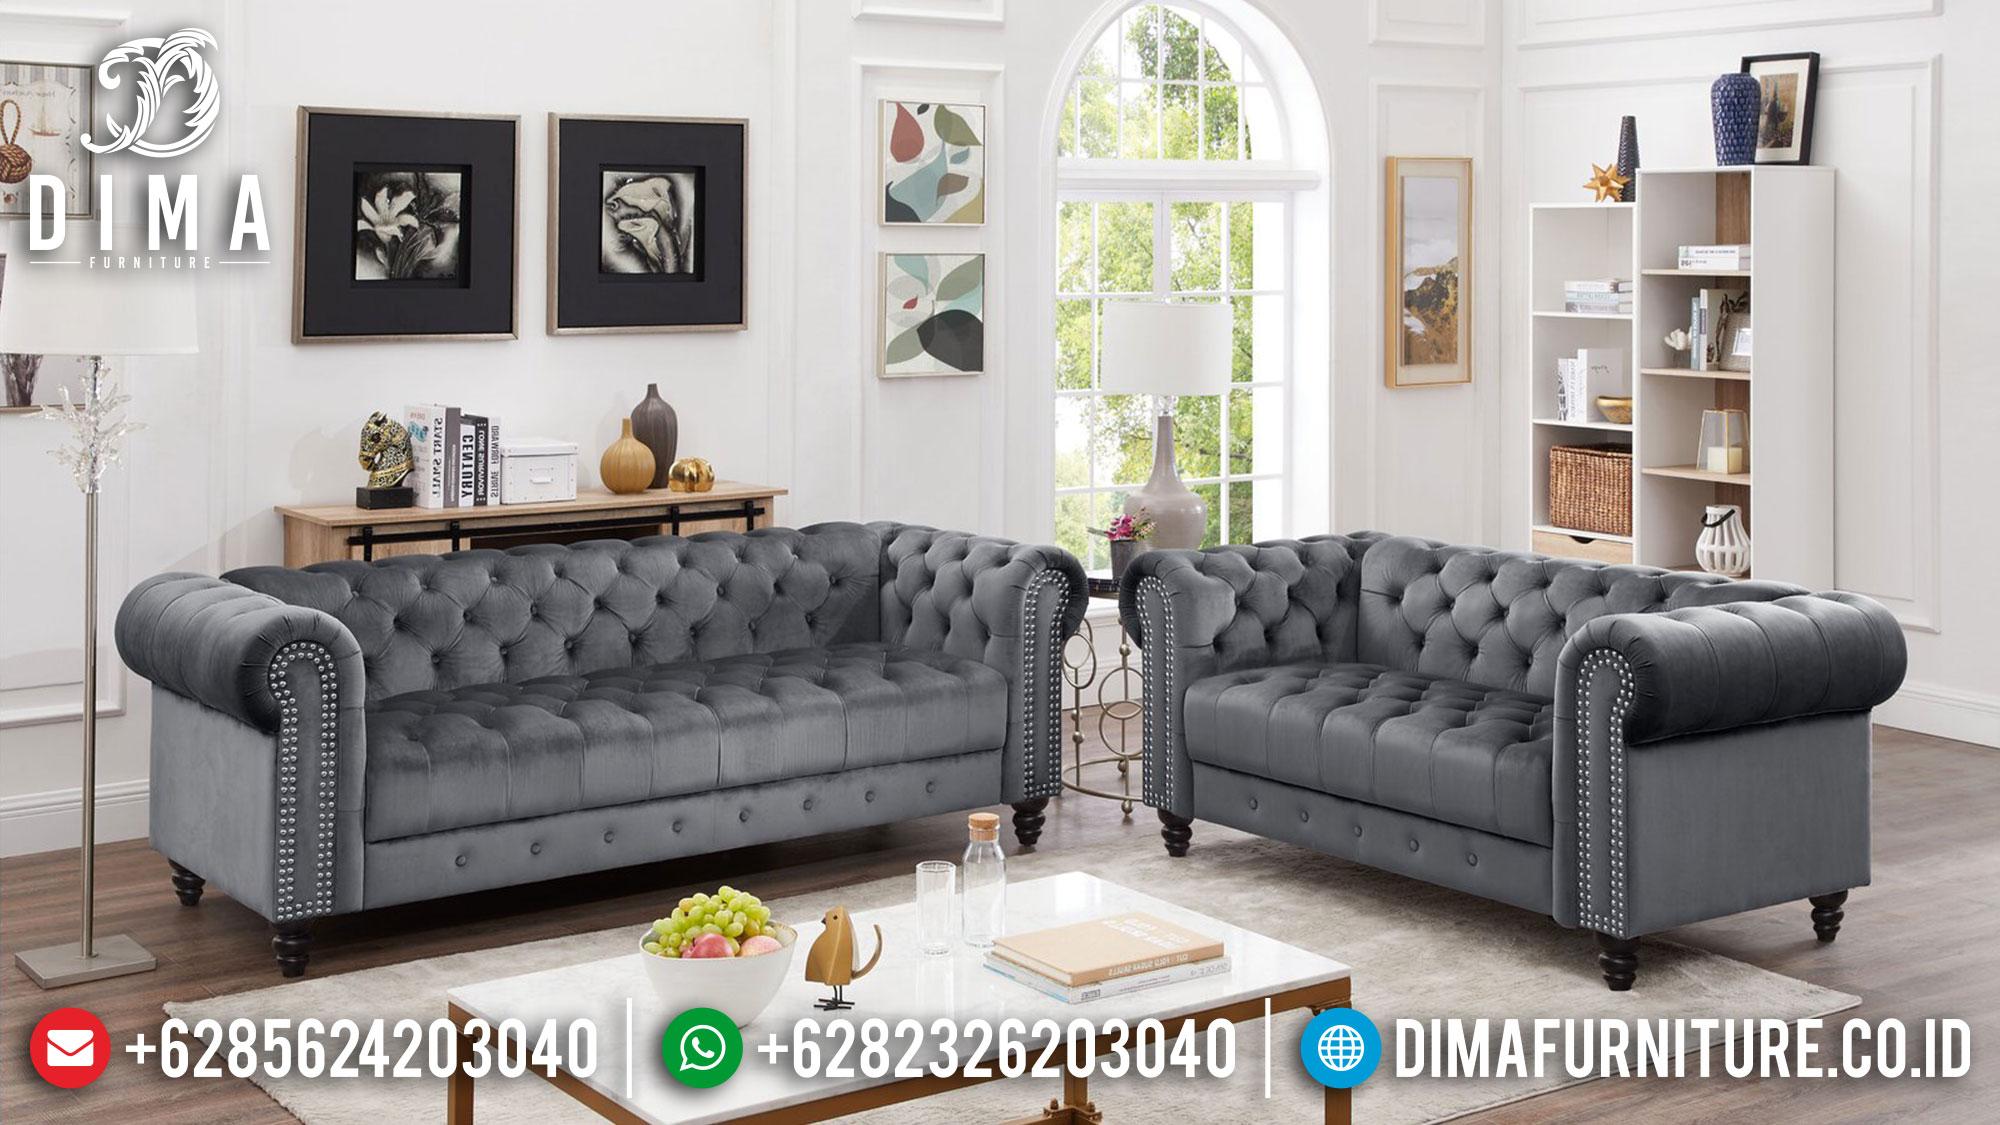 Sofa Tamu Minimalis Harga 2 Jutaan New Simple Classic Luxury Design Mm-1088